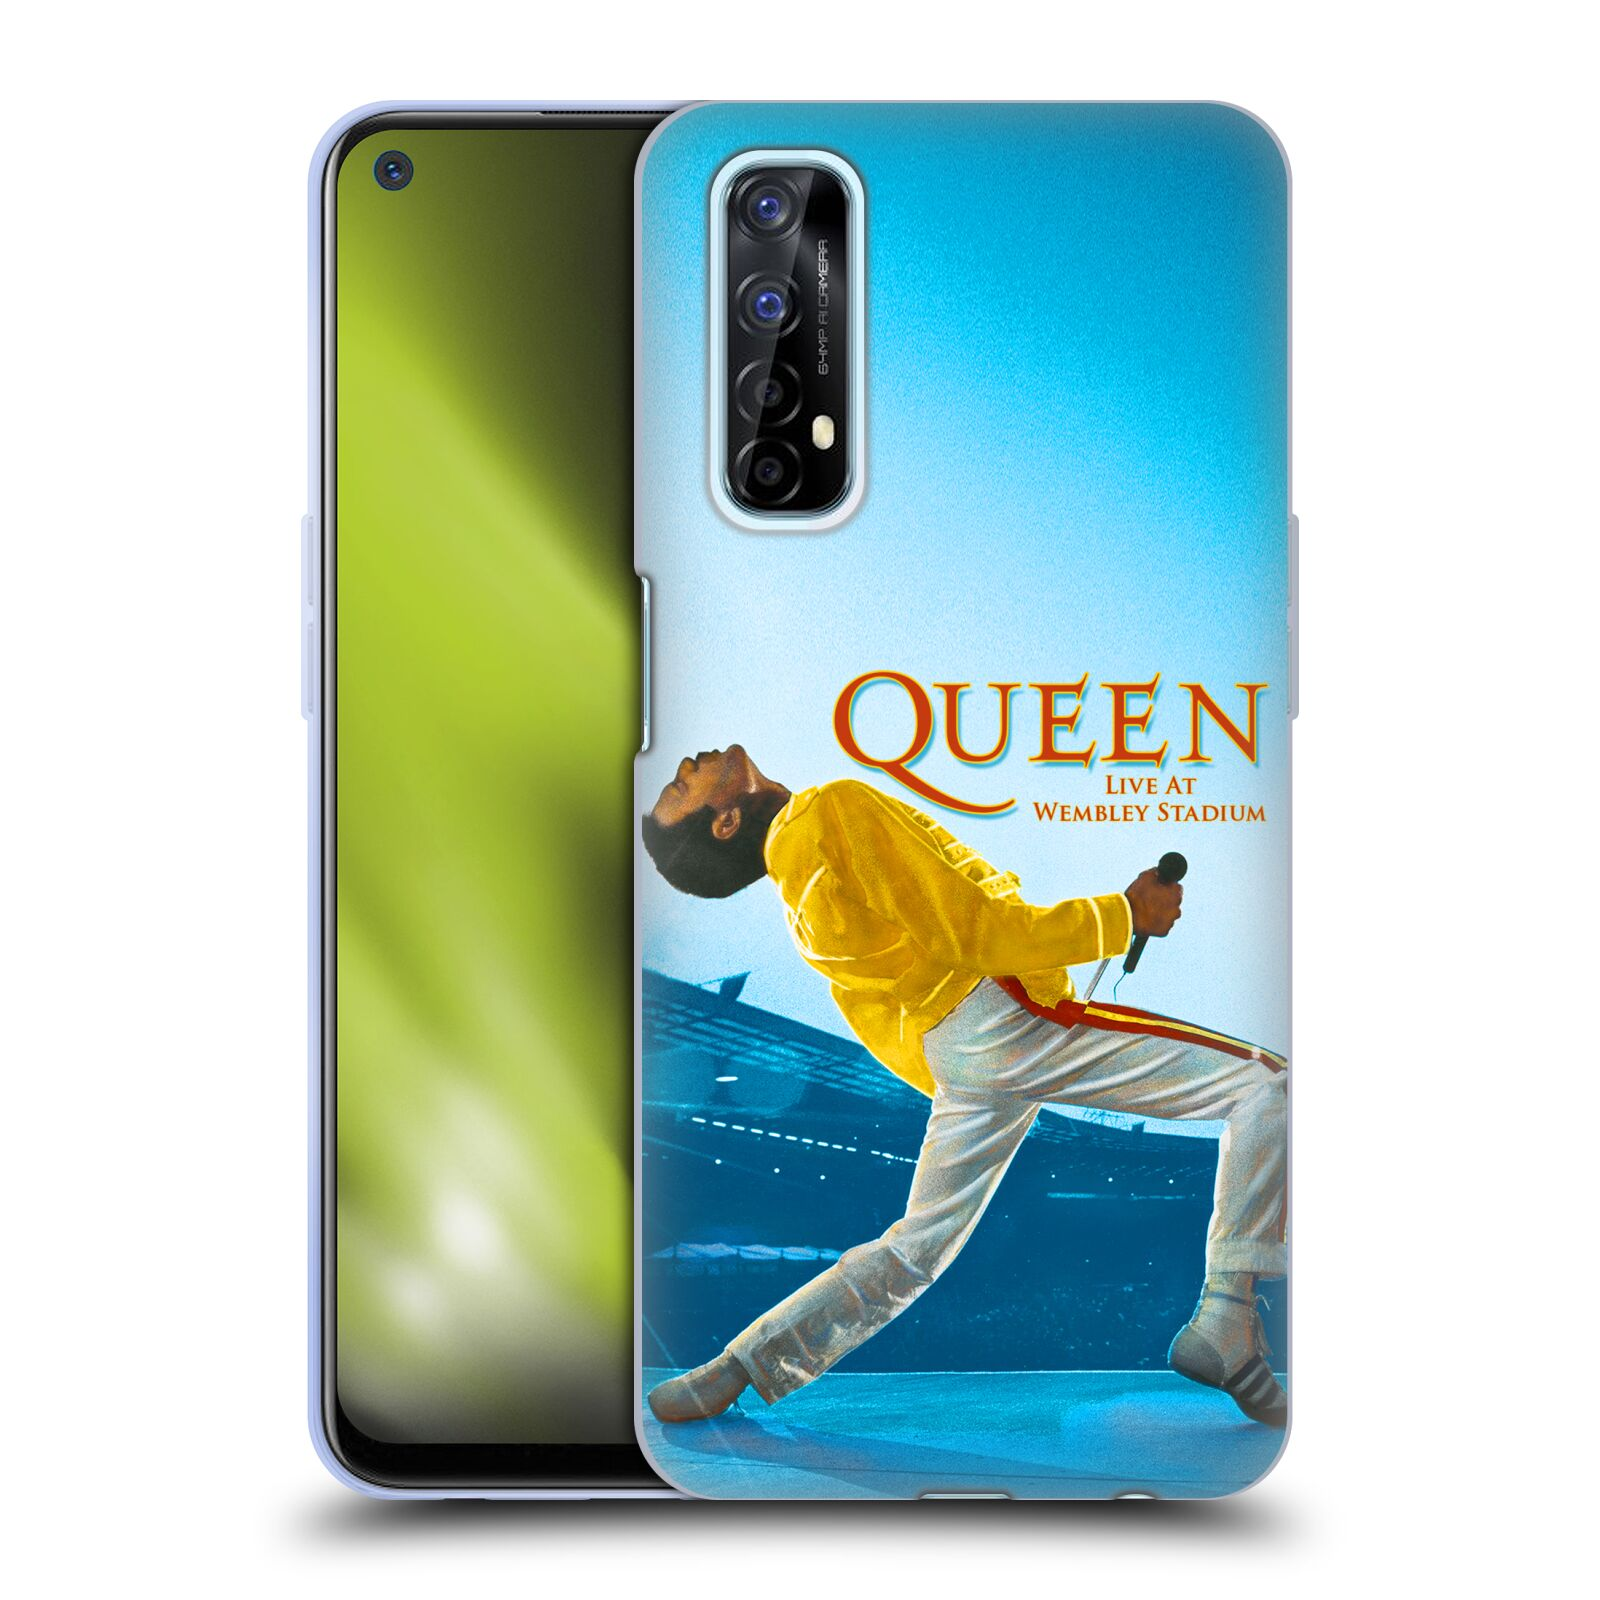 Silikonové pouzdro na mobil Realme 7 - Head Case - Queen - Freddie Mercury